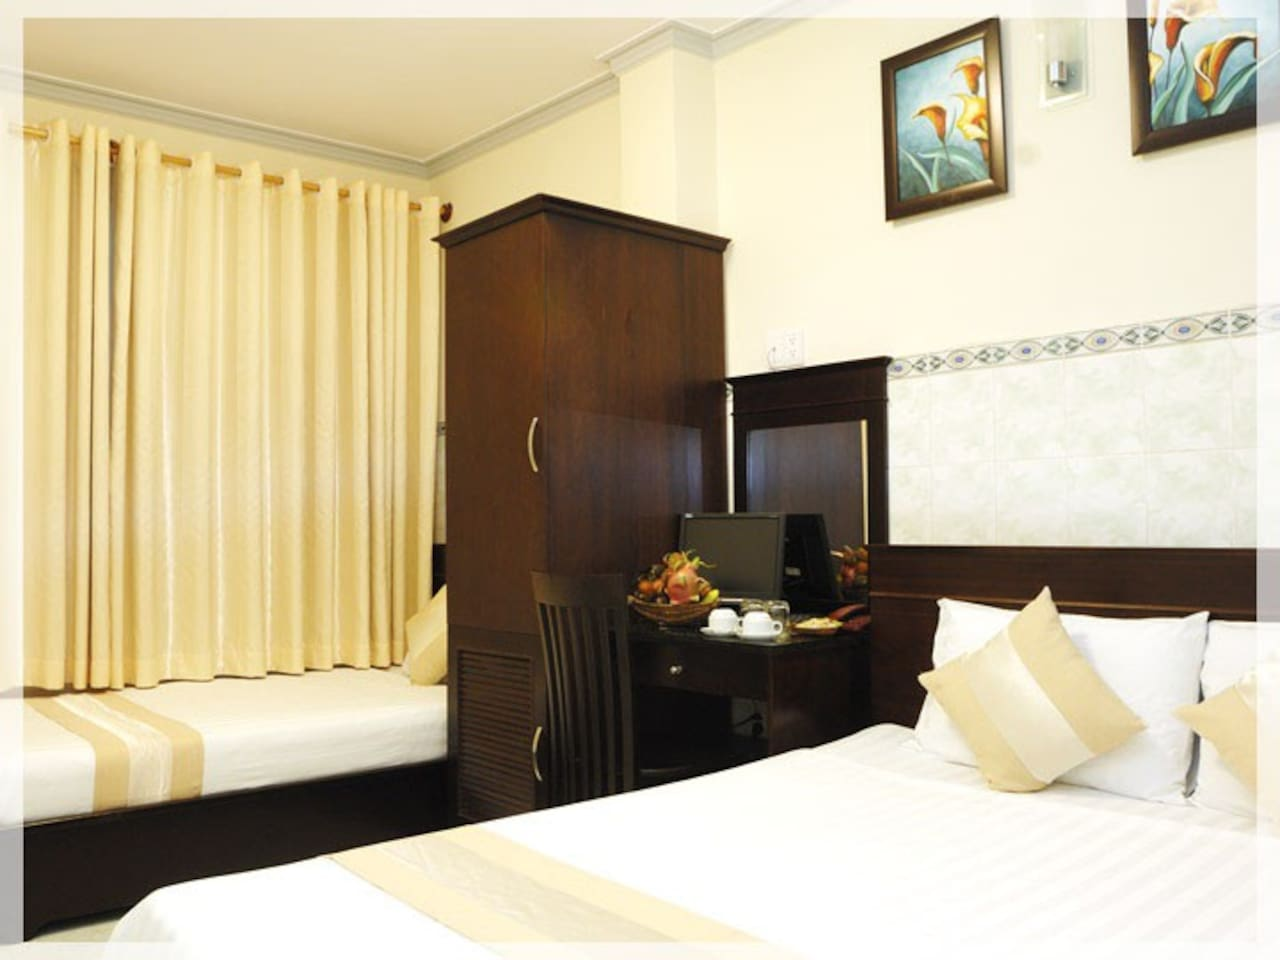 Standard Room at Tay Balo Street